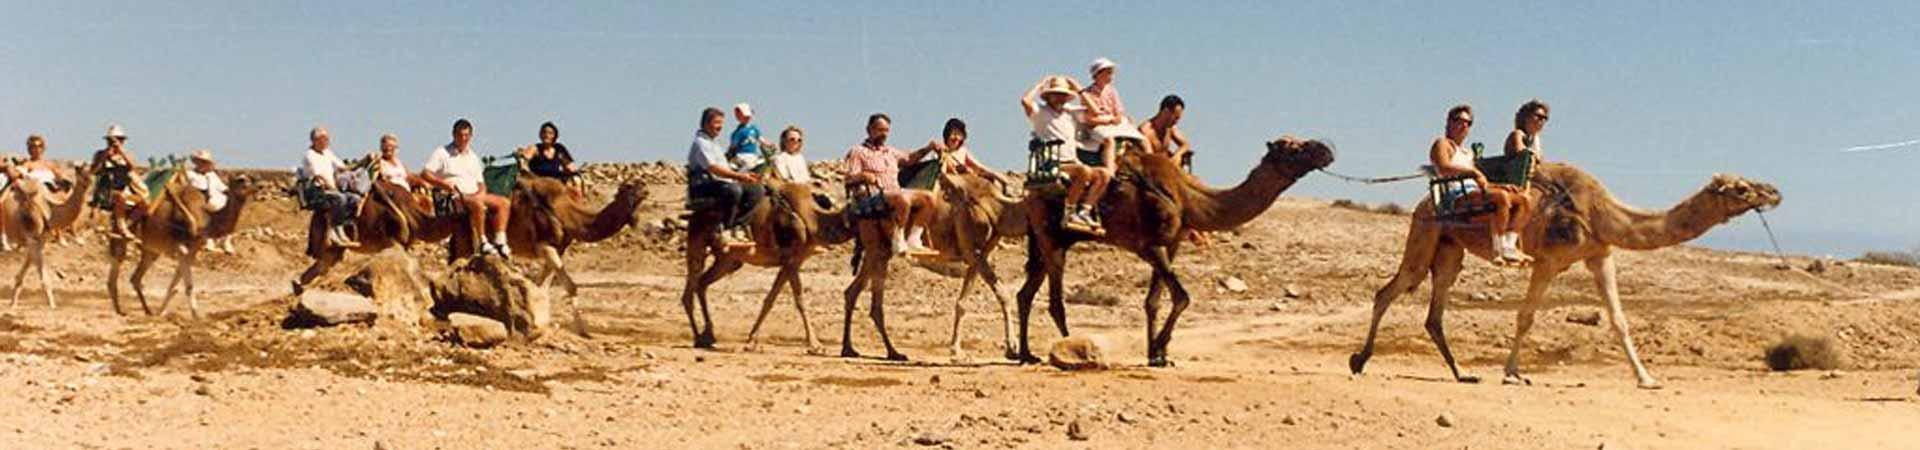 https://www.goodmorningtenerife.com/wp-content/uploads/2015/07/01_slide_camel-park-1920x450-1.jpg